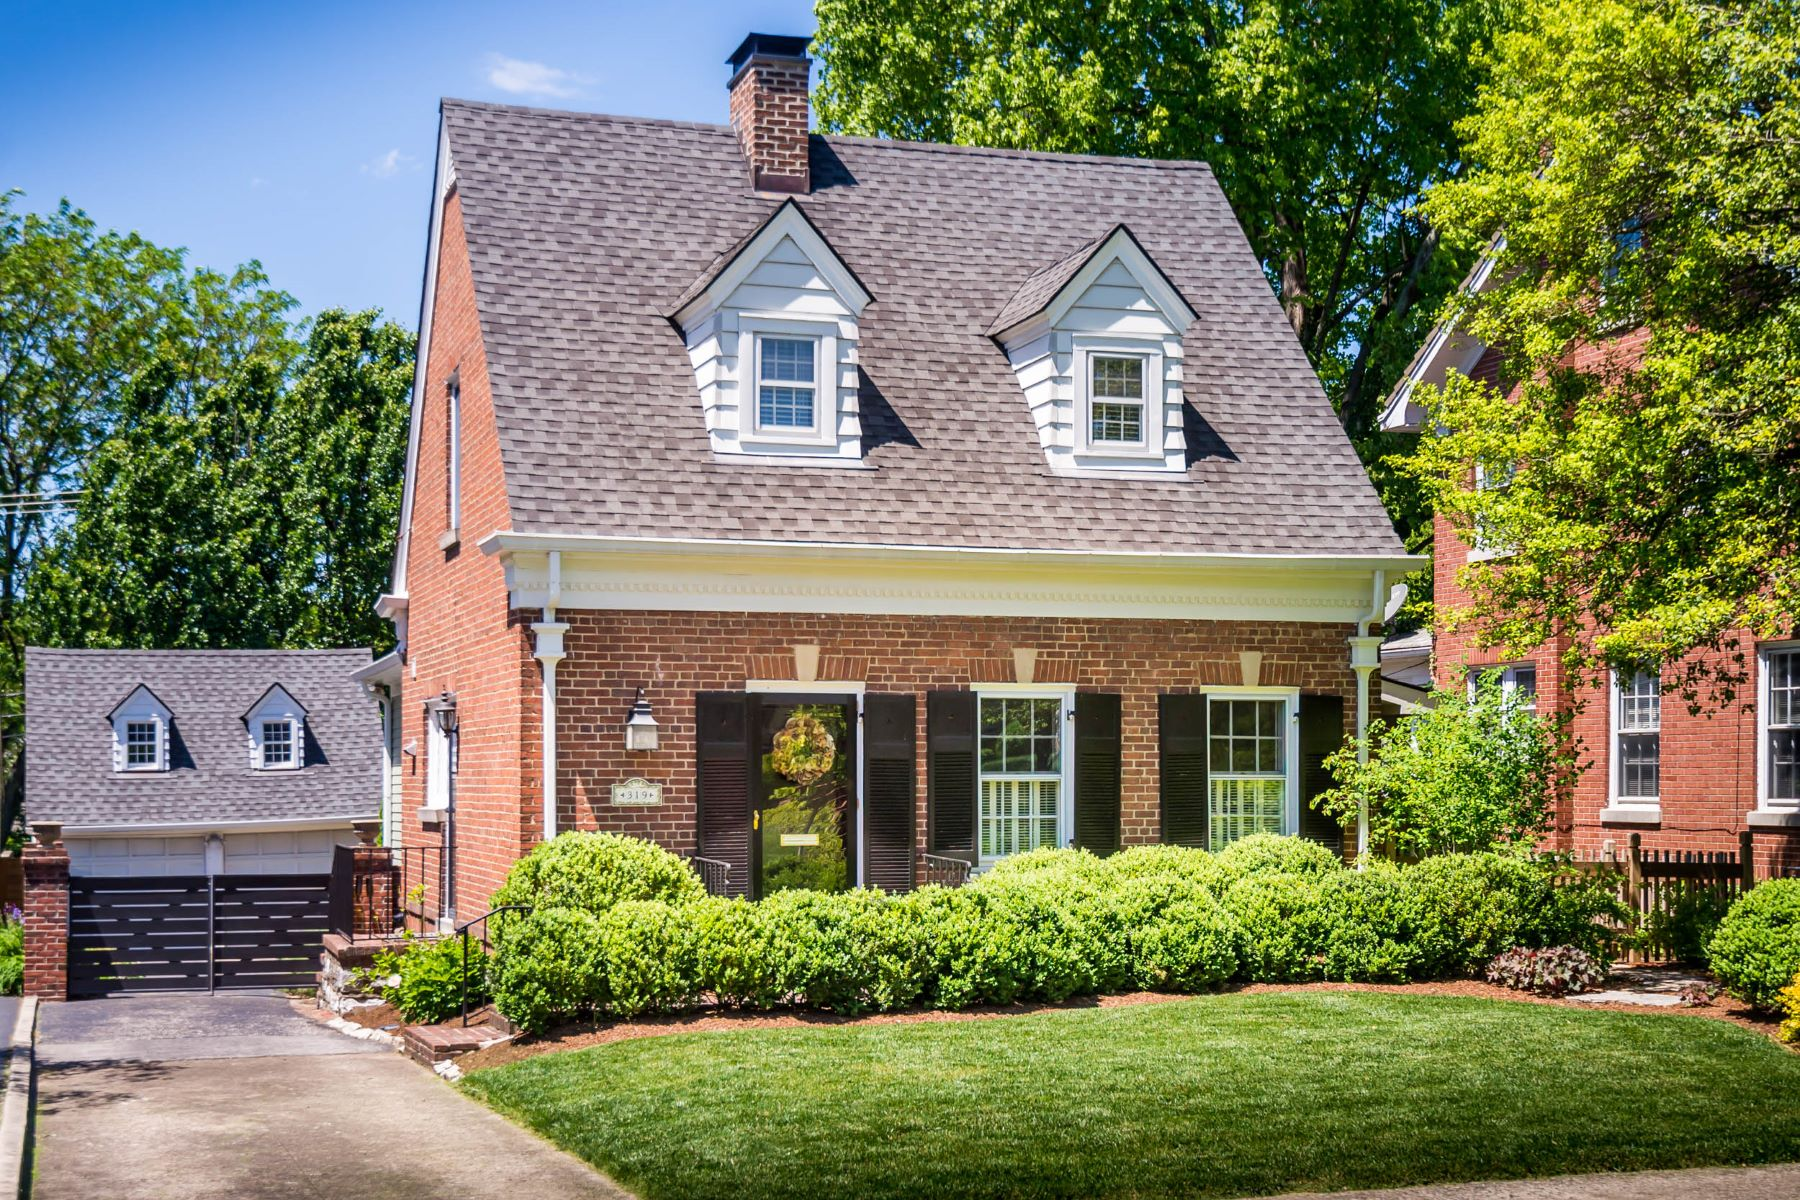 Single Family Home for Sale at 319 Ridgeway Road Lexington, Kentucky 40502 United States